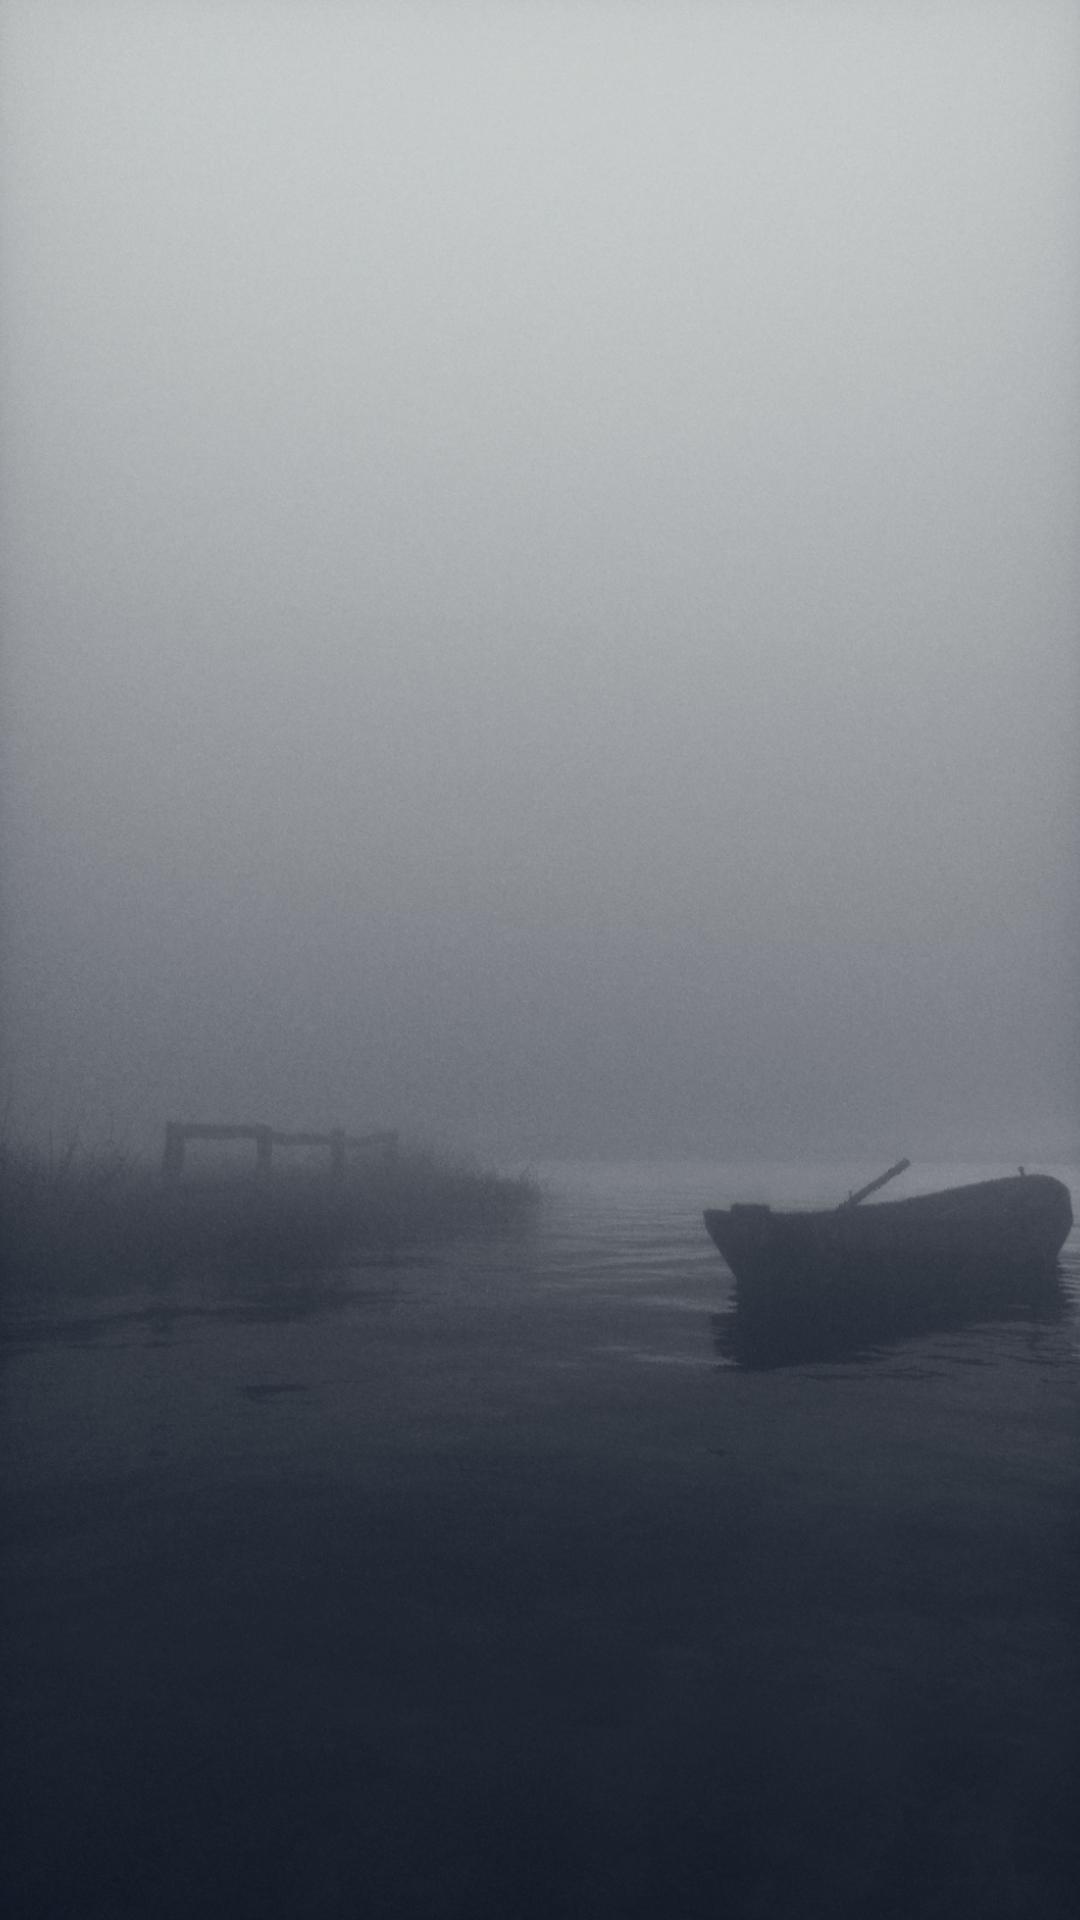 cinema 4d octane fog peaceful calm lake Render Realism